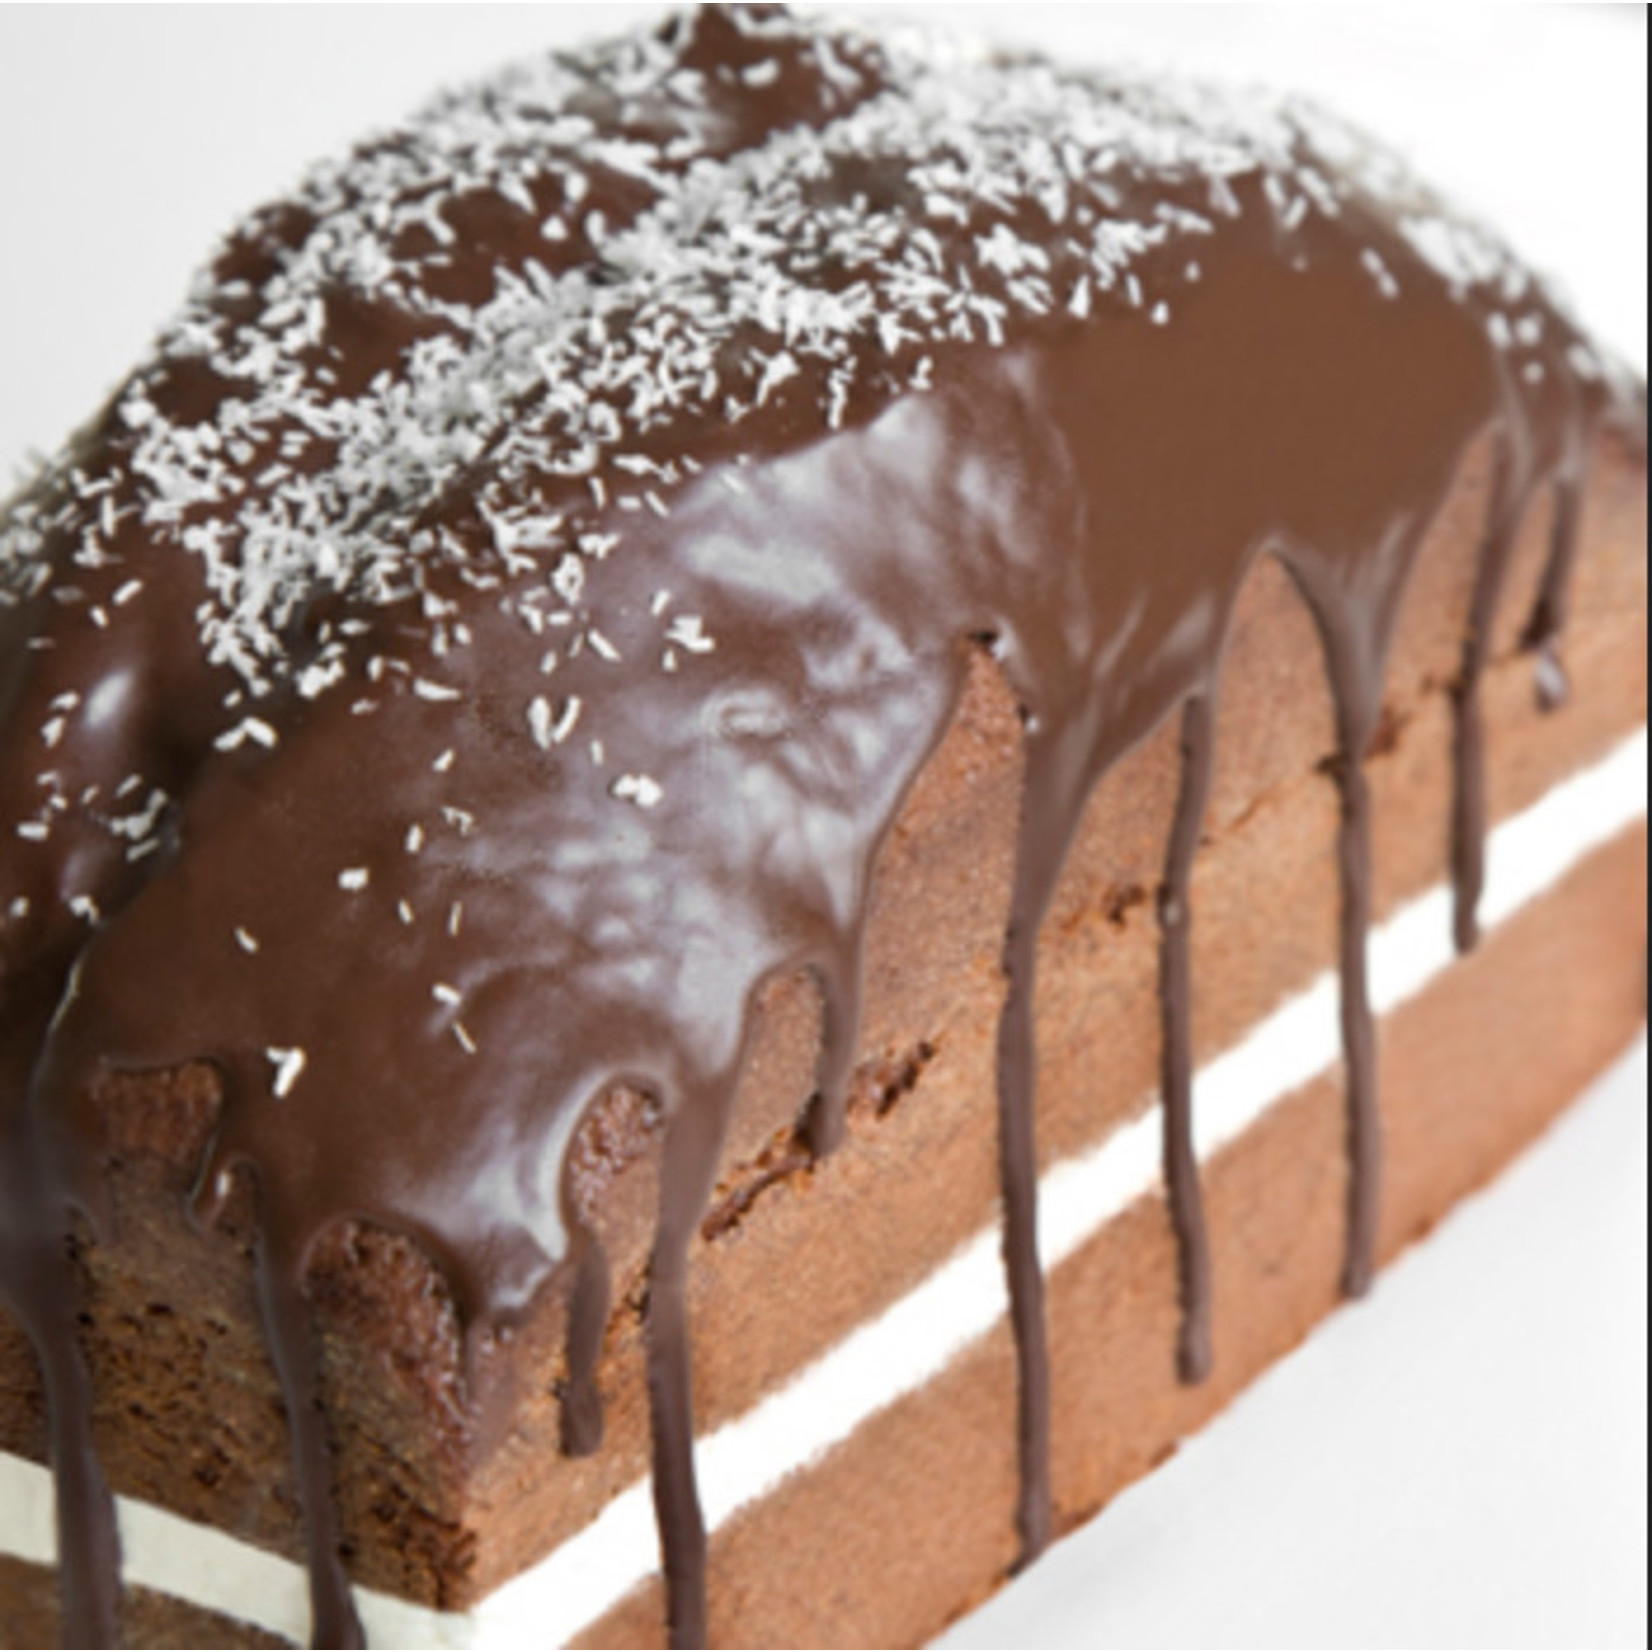 Irca Irca - Chocosmart Chocolate Ganache, 5kg/11lb - 01010197